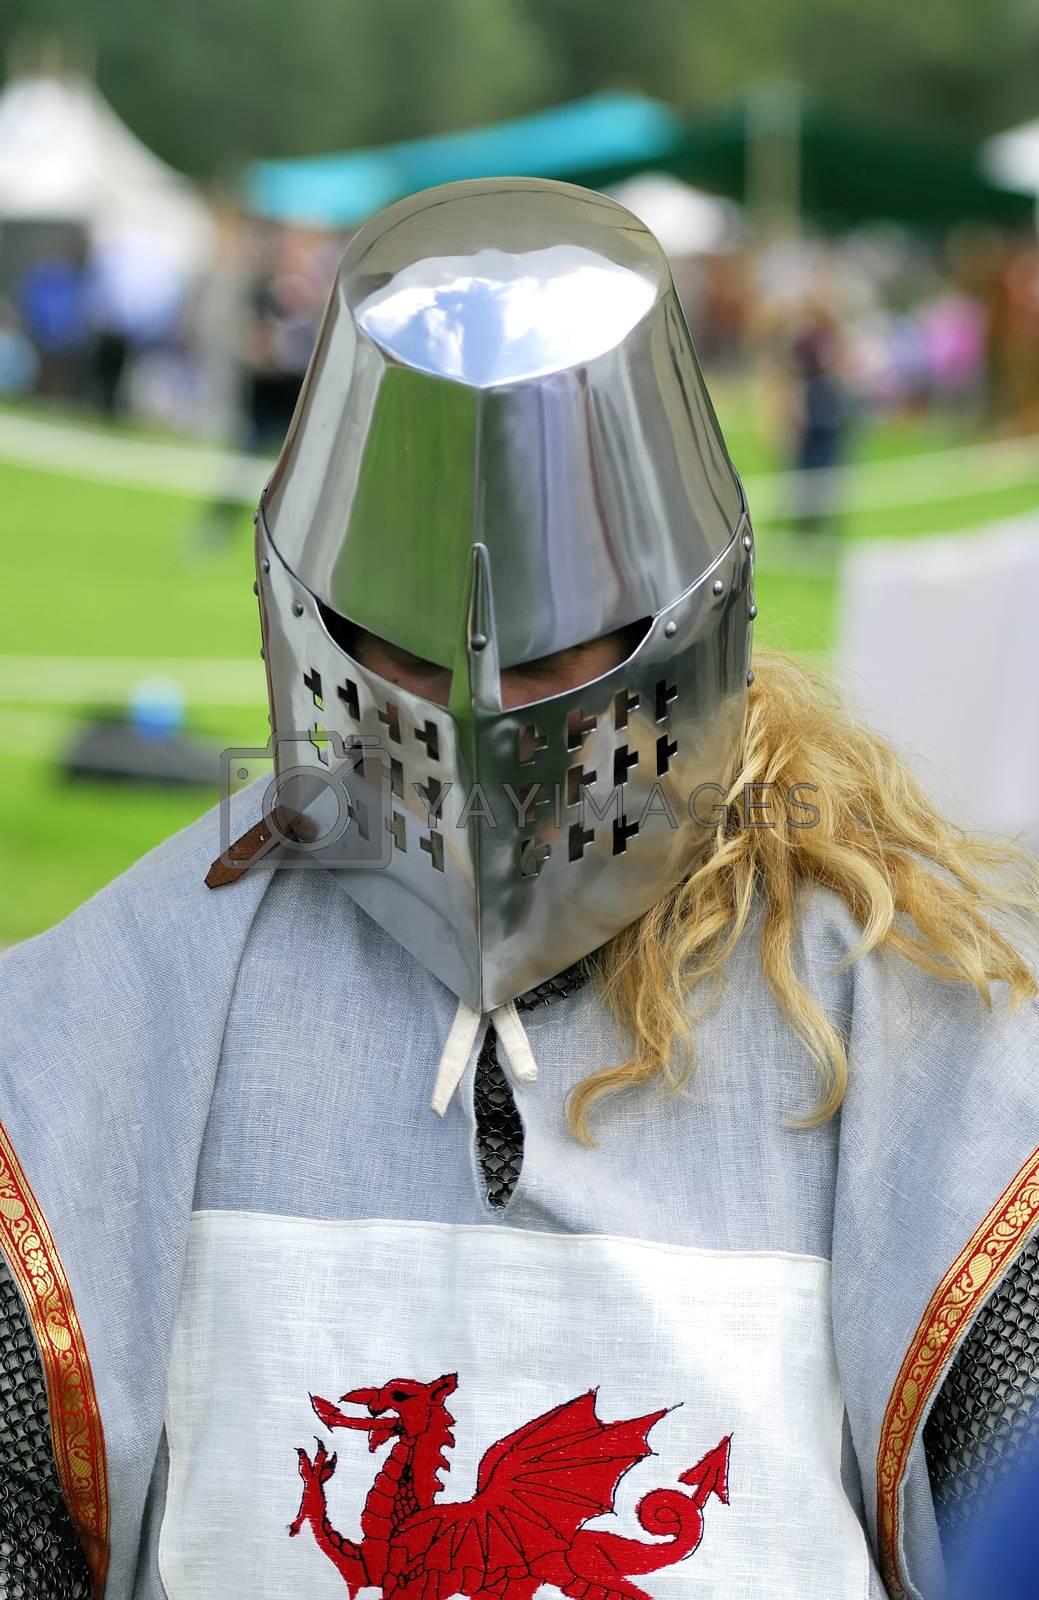 Knight's helmet in medieval style.